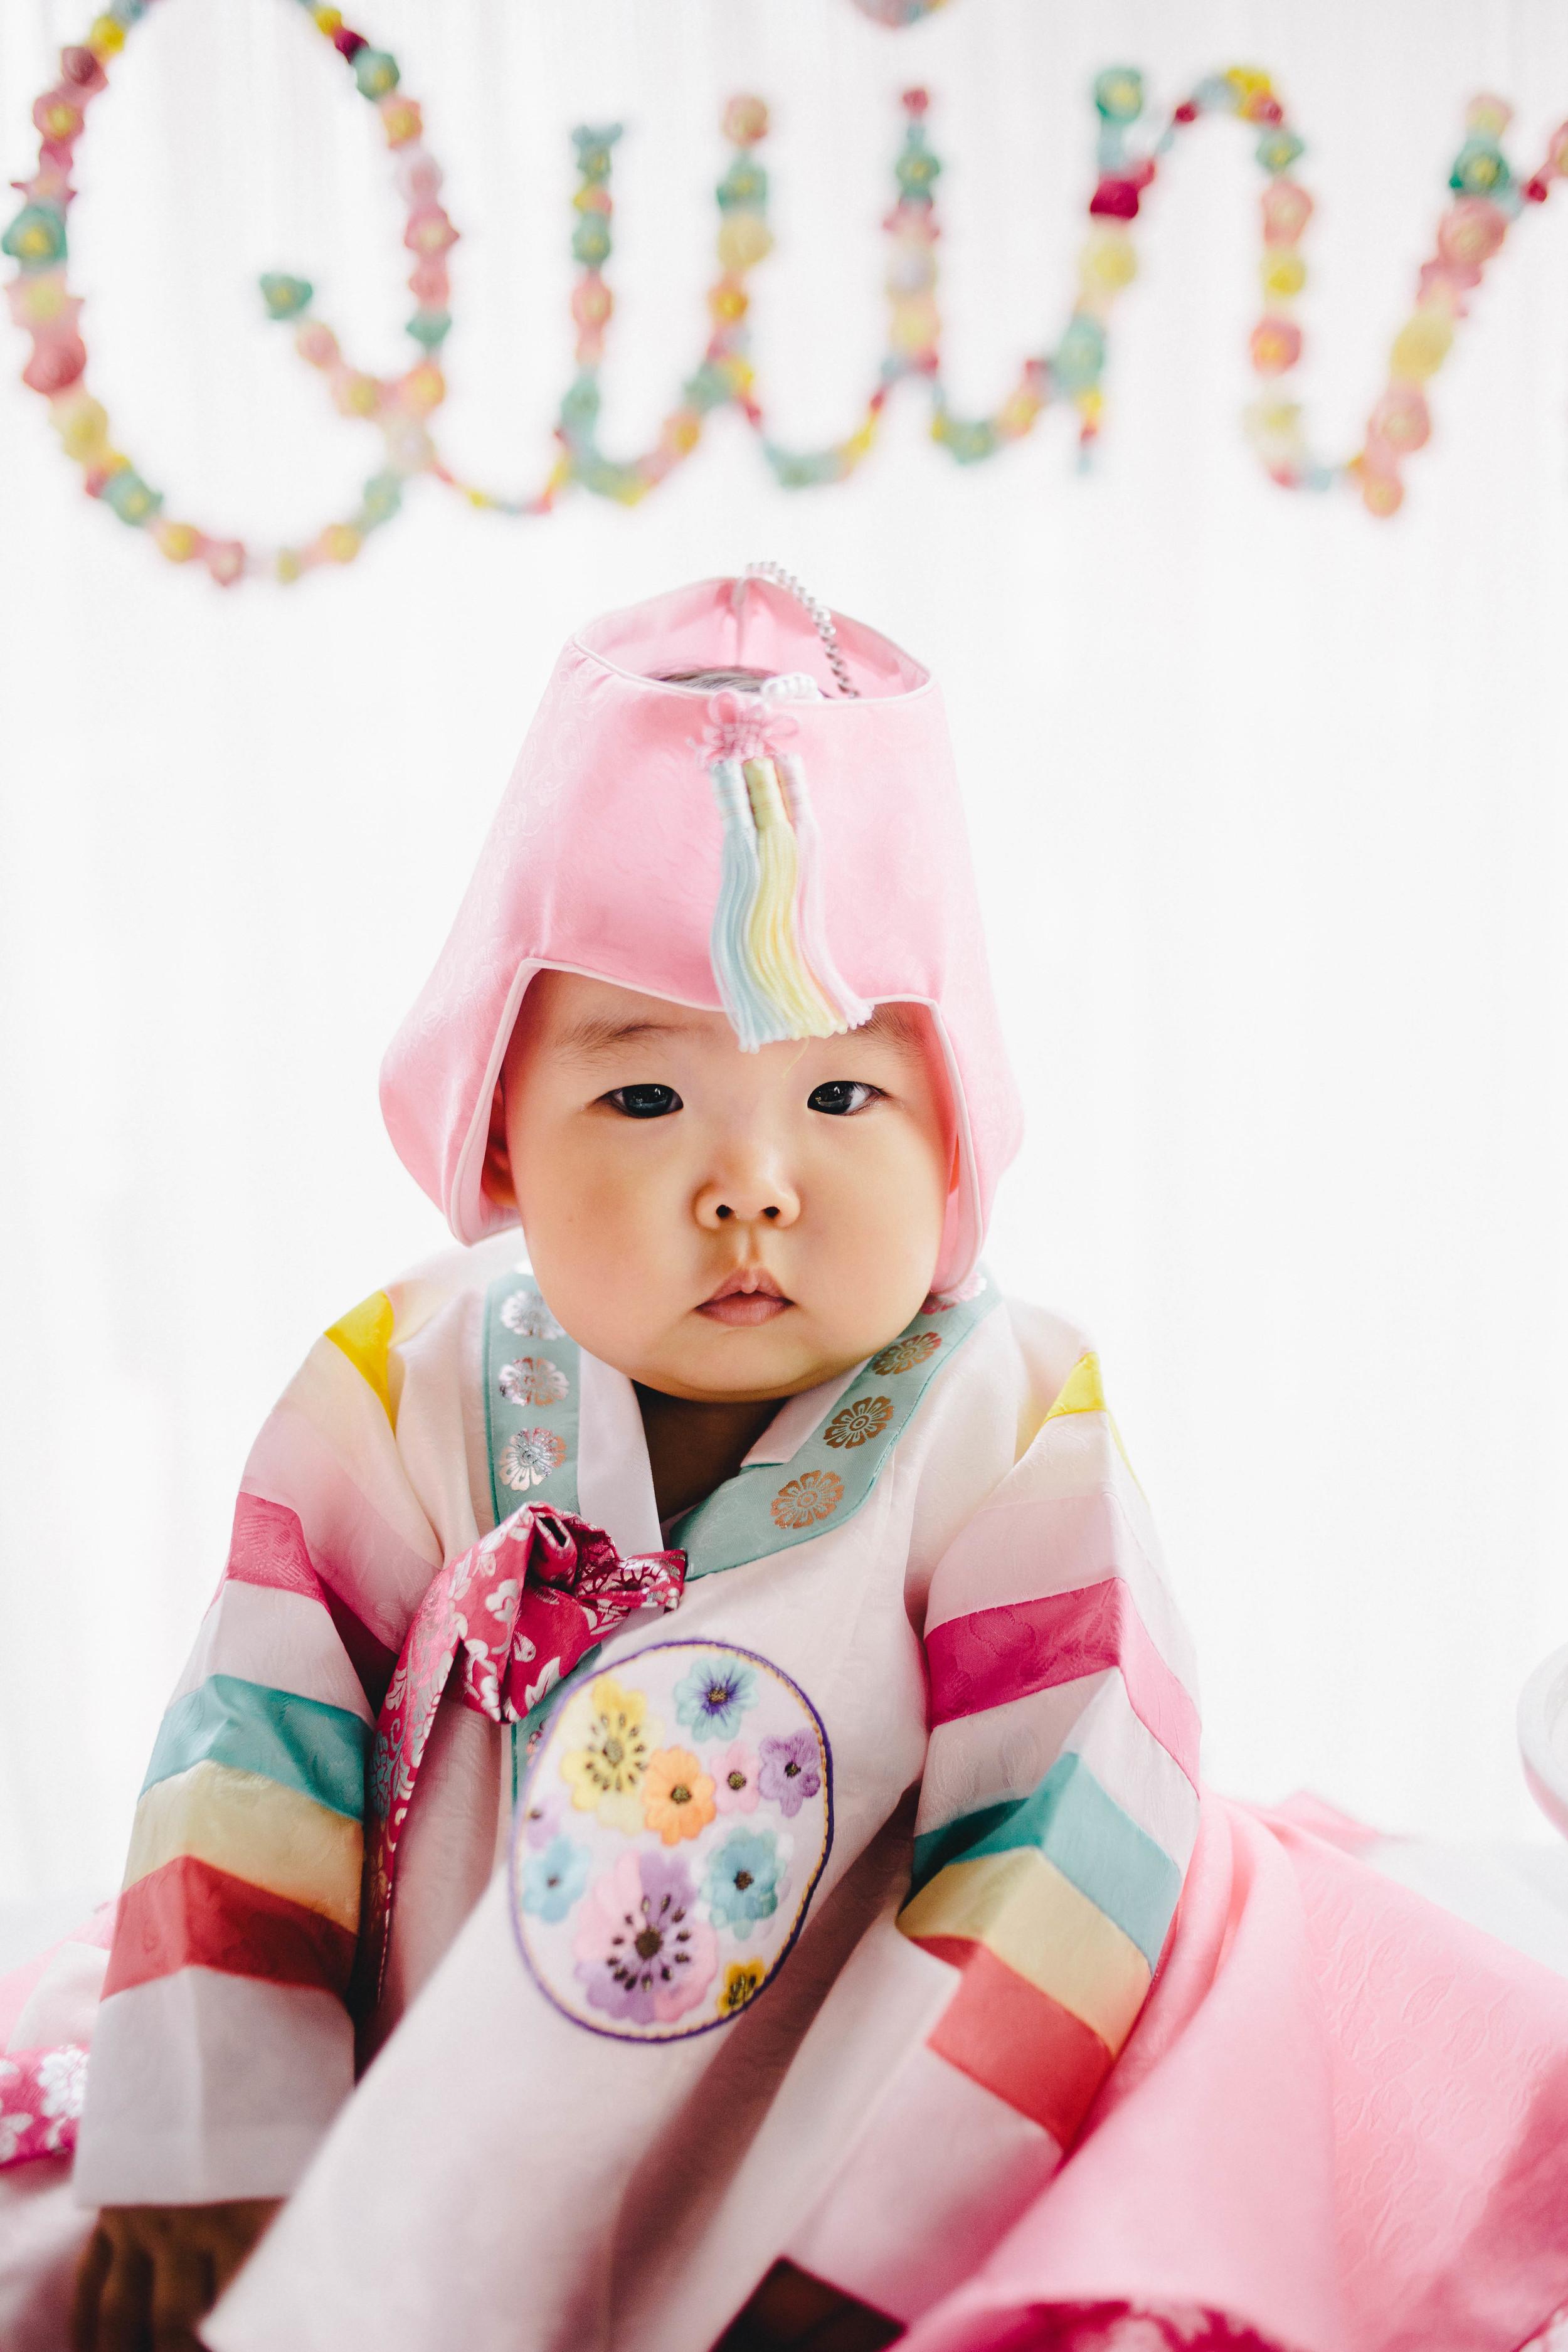 quinn_firstbirthday (256 of 305).jpg